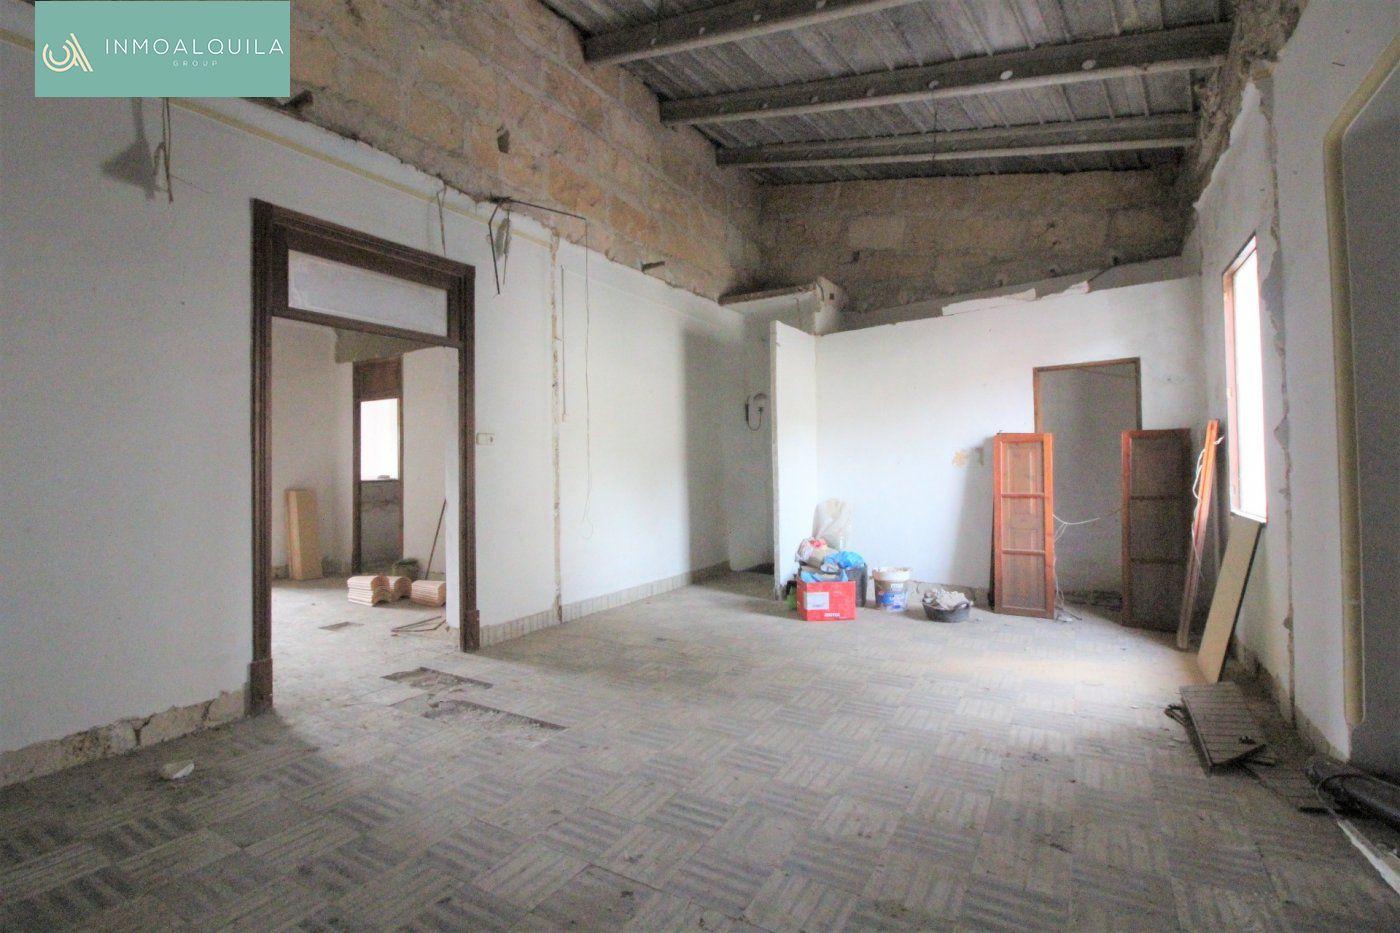 Pis  Lloseta ,lloseta. Primer piso techo libre en lloseta para reformar de 124 m2